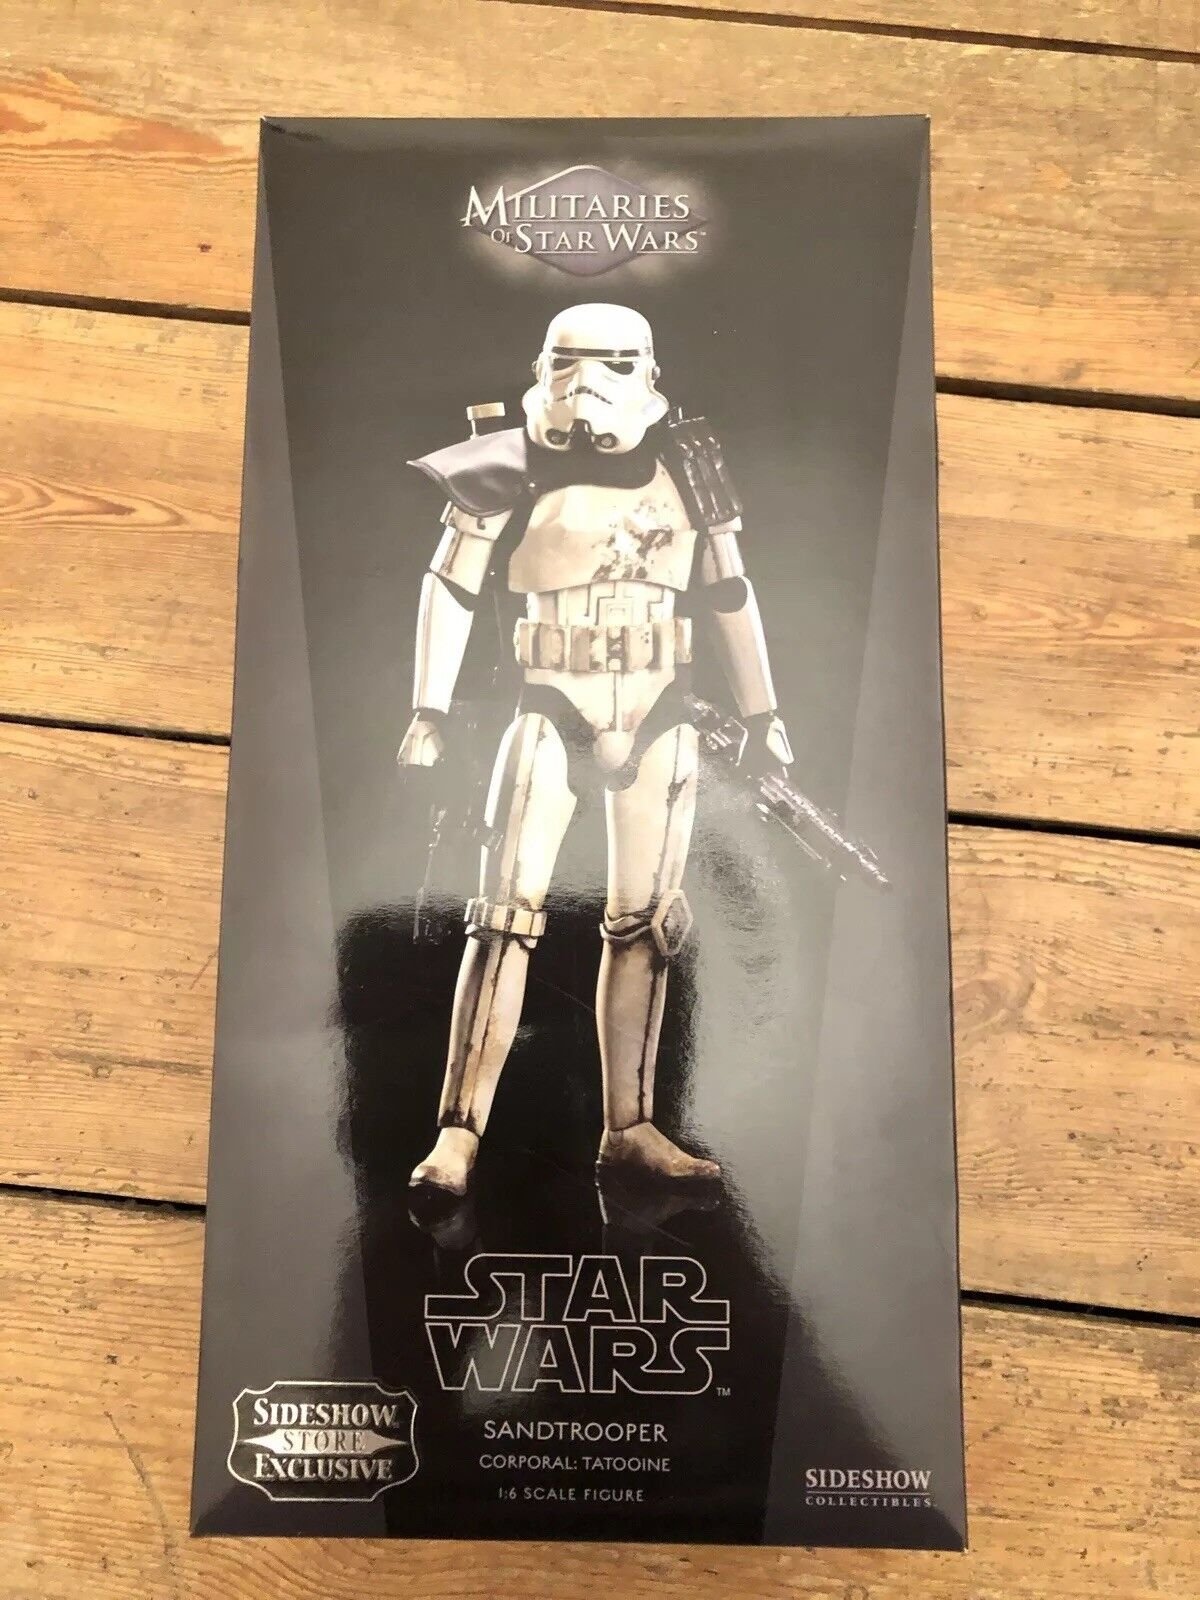 Militarier från stjärnornas krig Sandtroopers exklusiva korpral Tatooine SSC1108